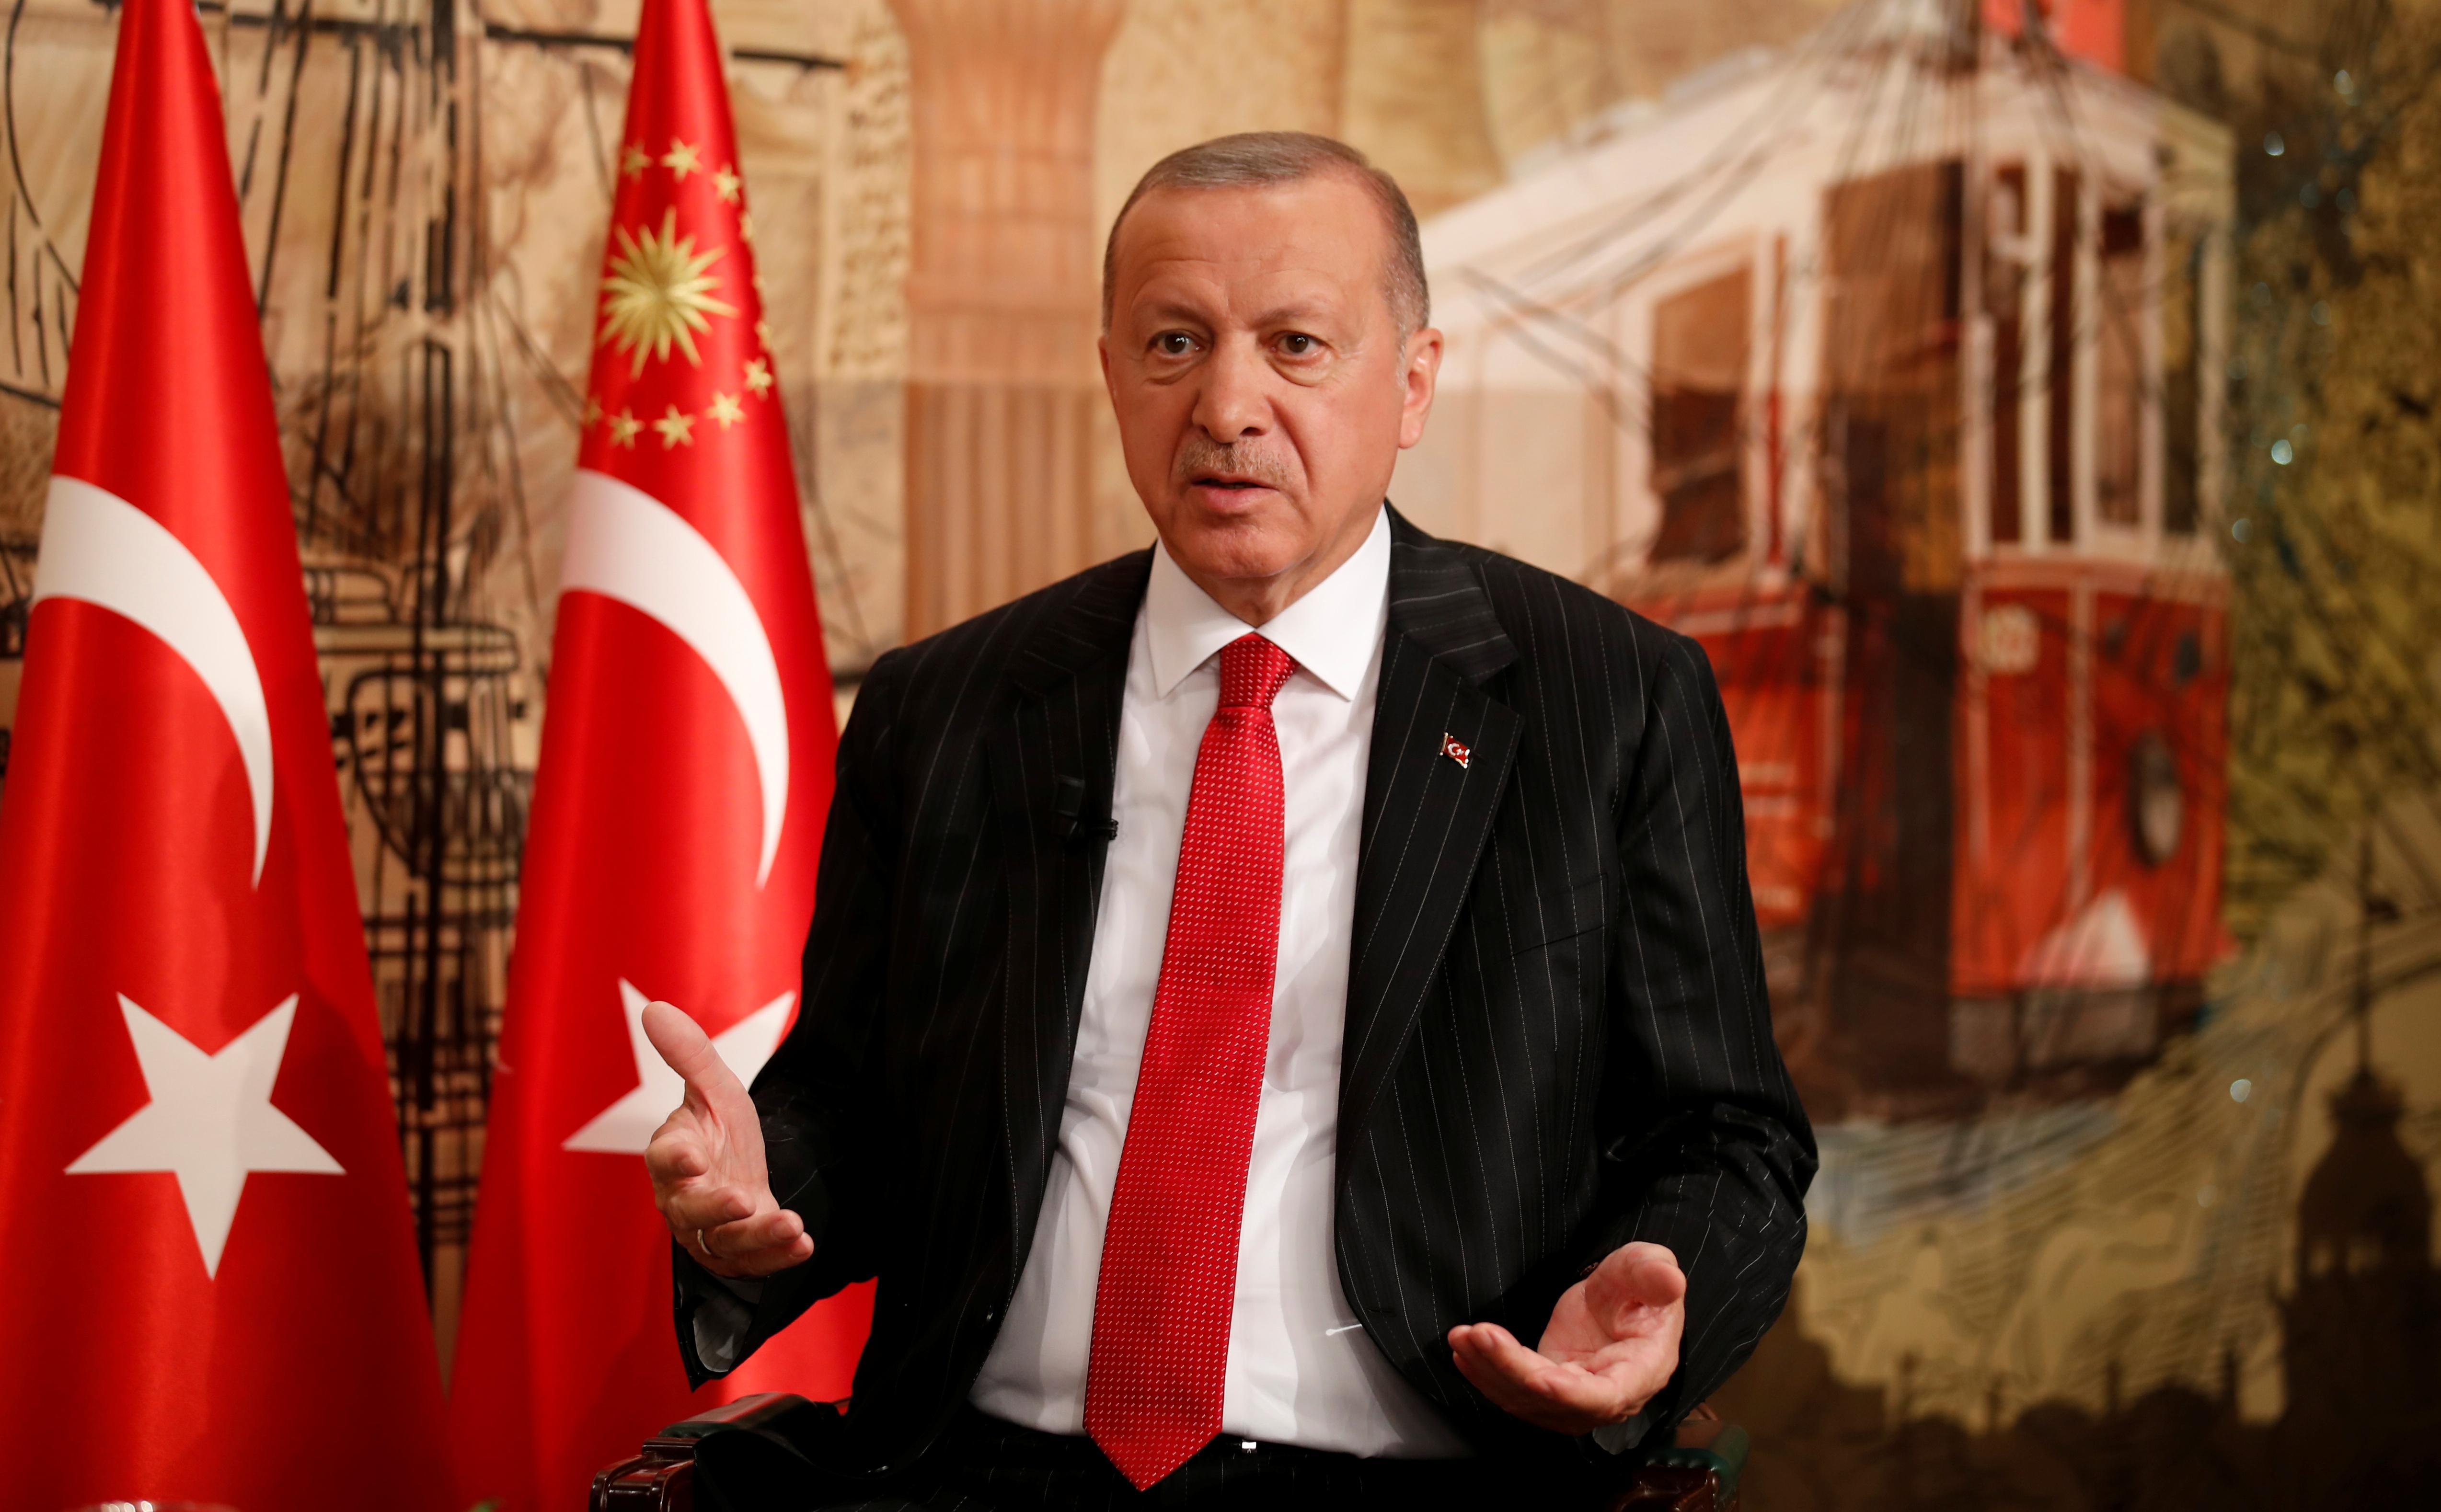 Exclusive: Turkey's Erdogan says to discuss with Trump buying U.S. Patriot missiles